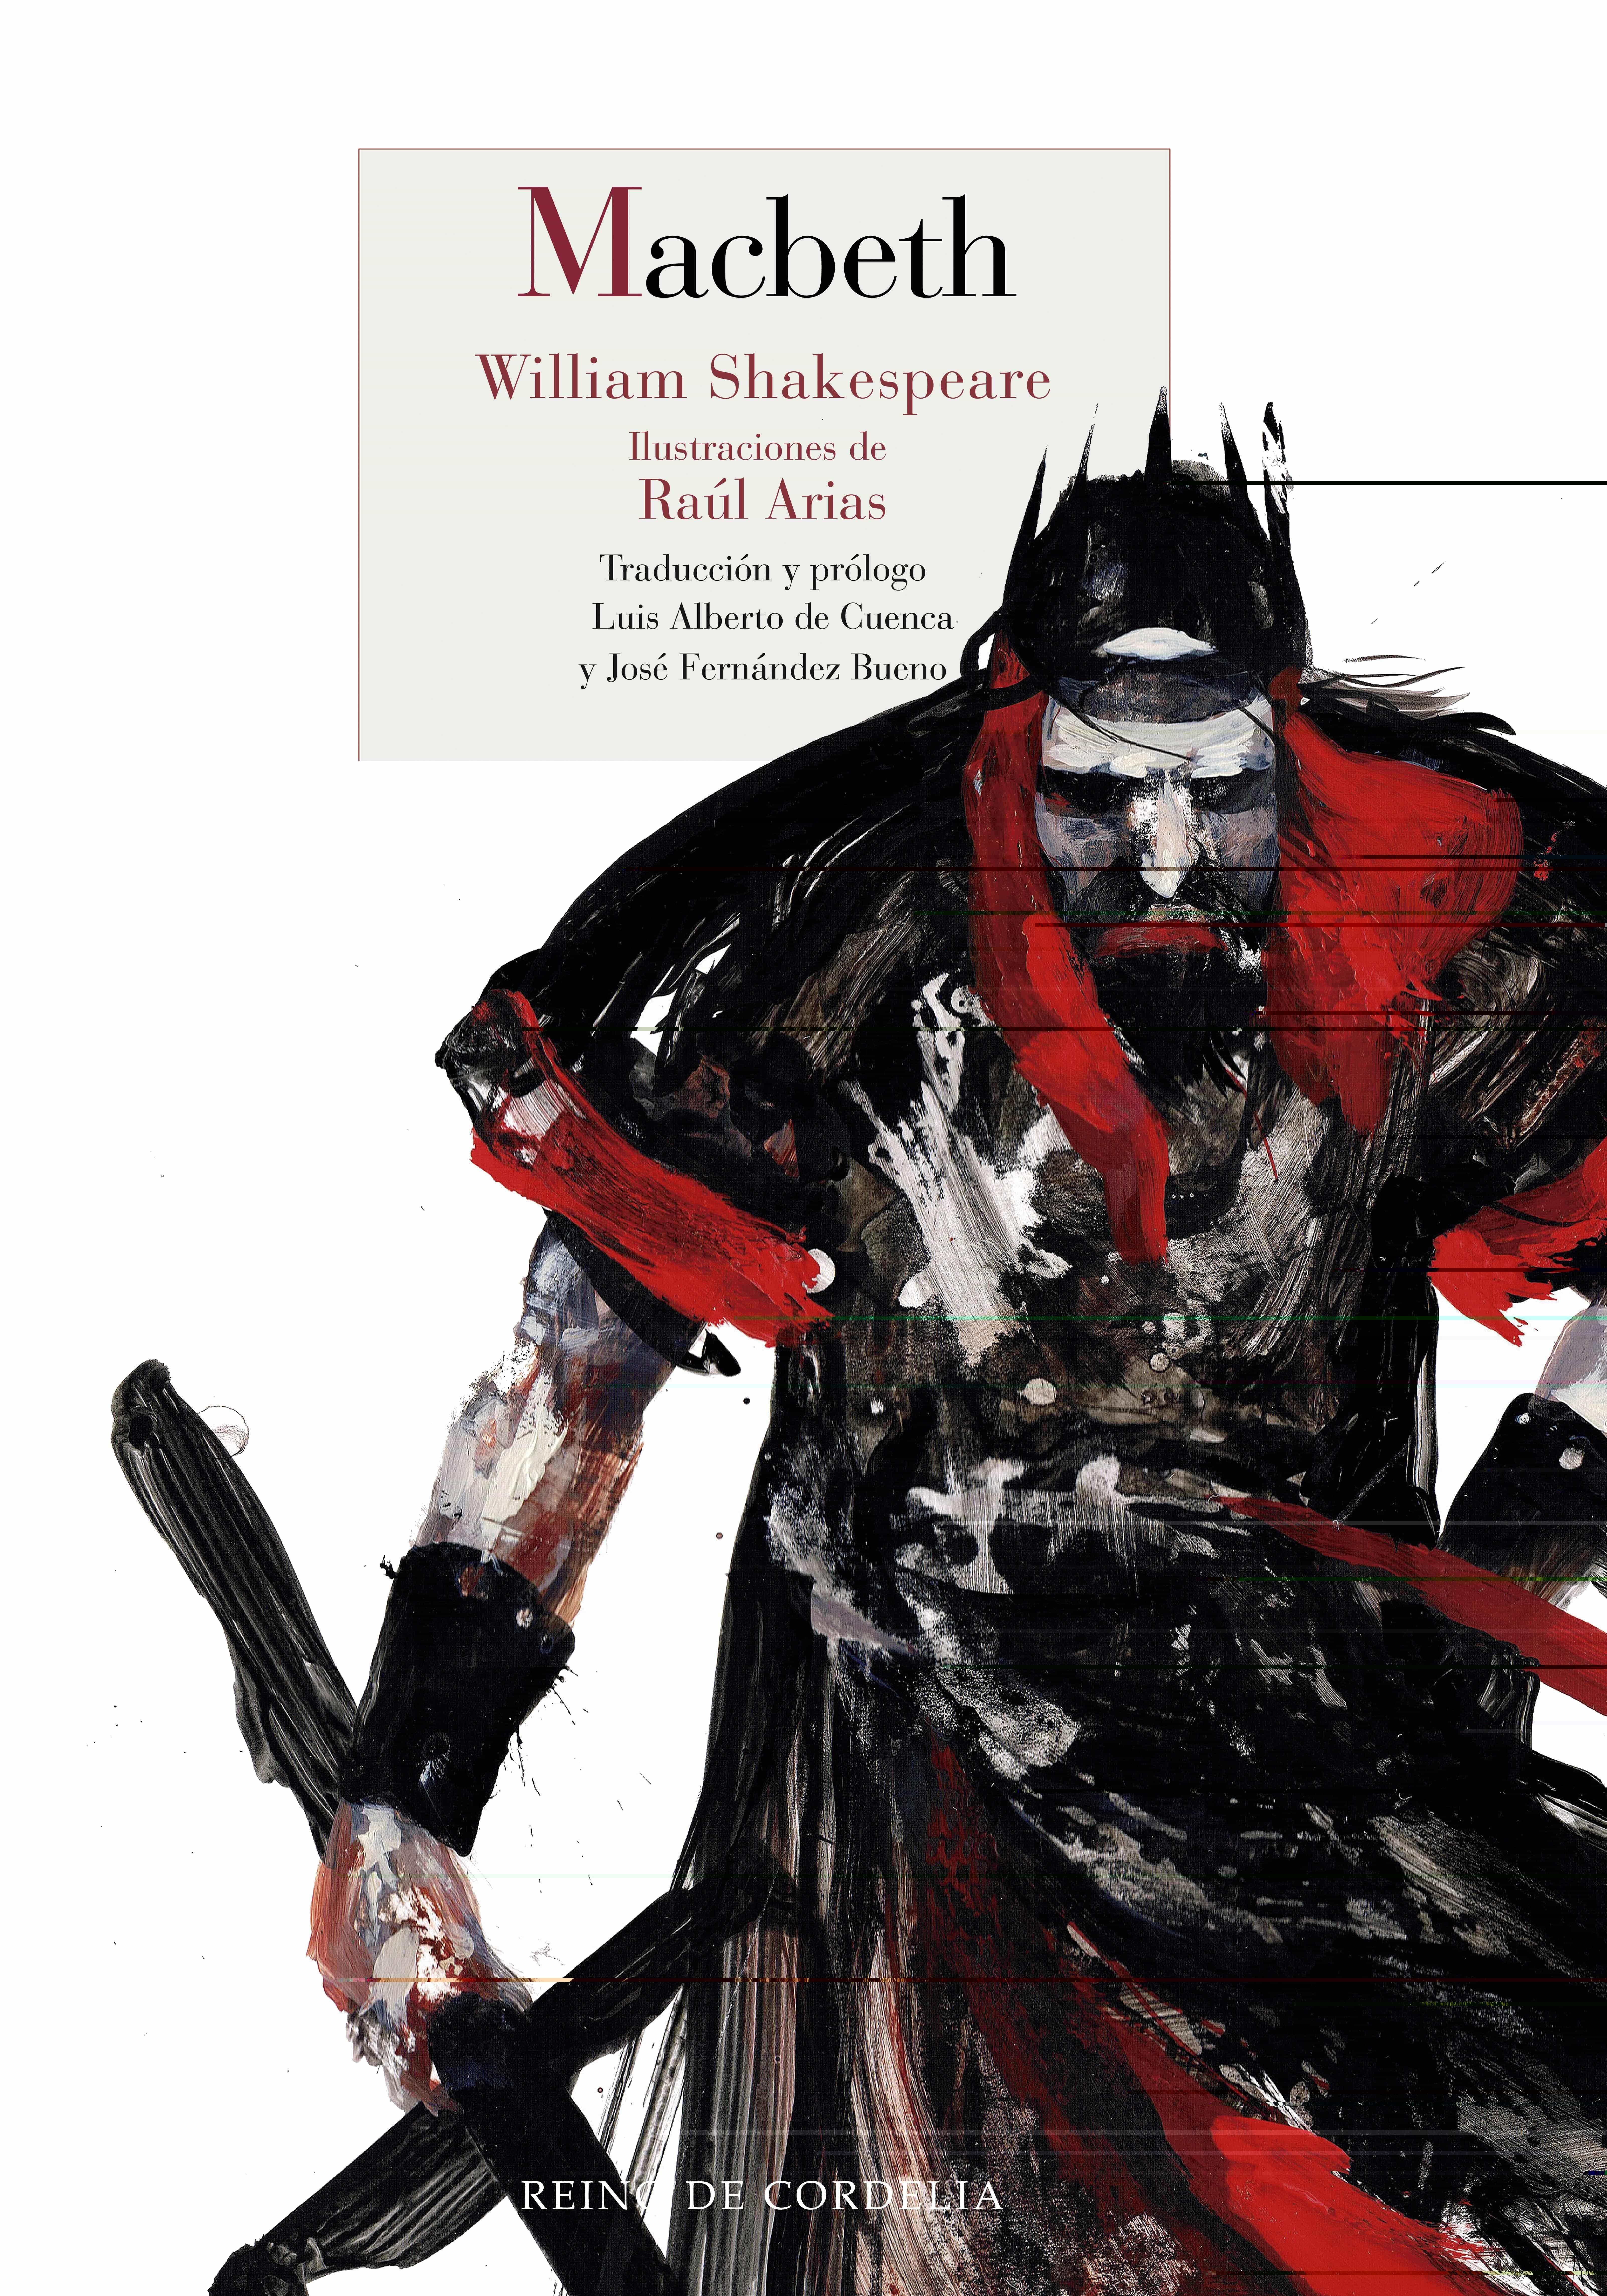 MACBETH | WILLIAM SHAKESPEARE | Comprar libro 9788415973539